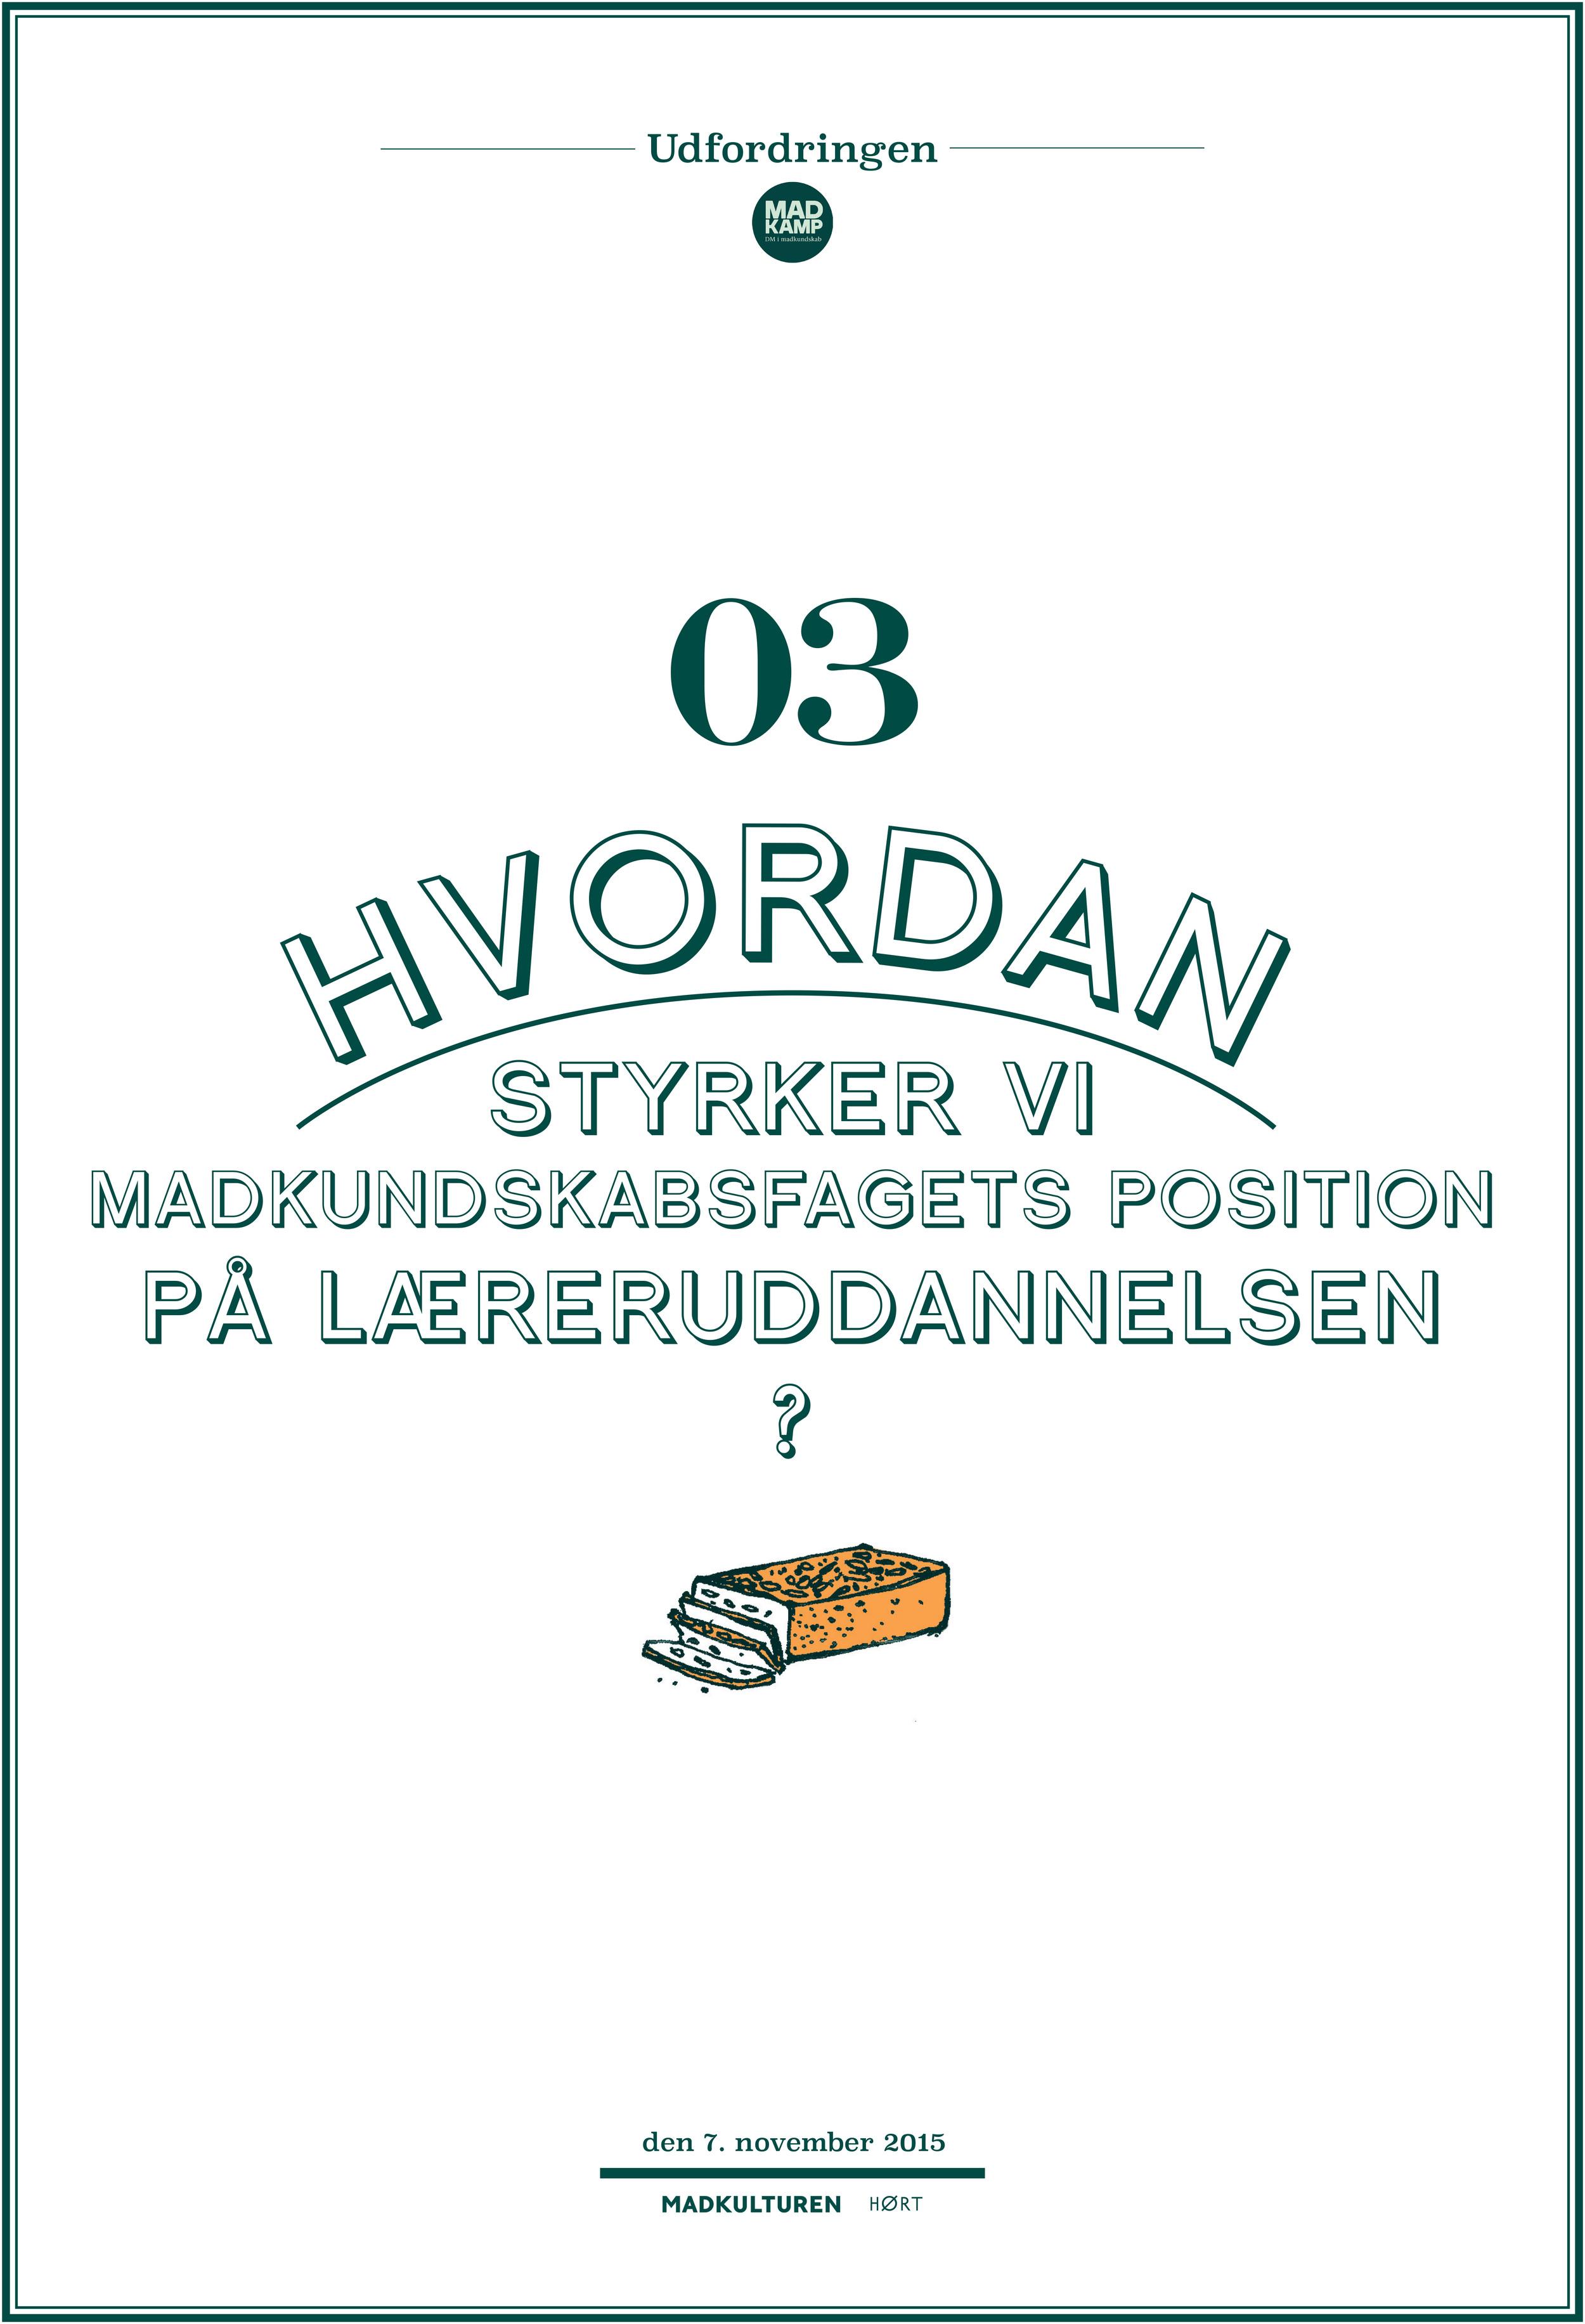 Madkamp_A1-02_Udfordringer-3.jpg